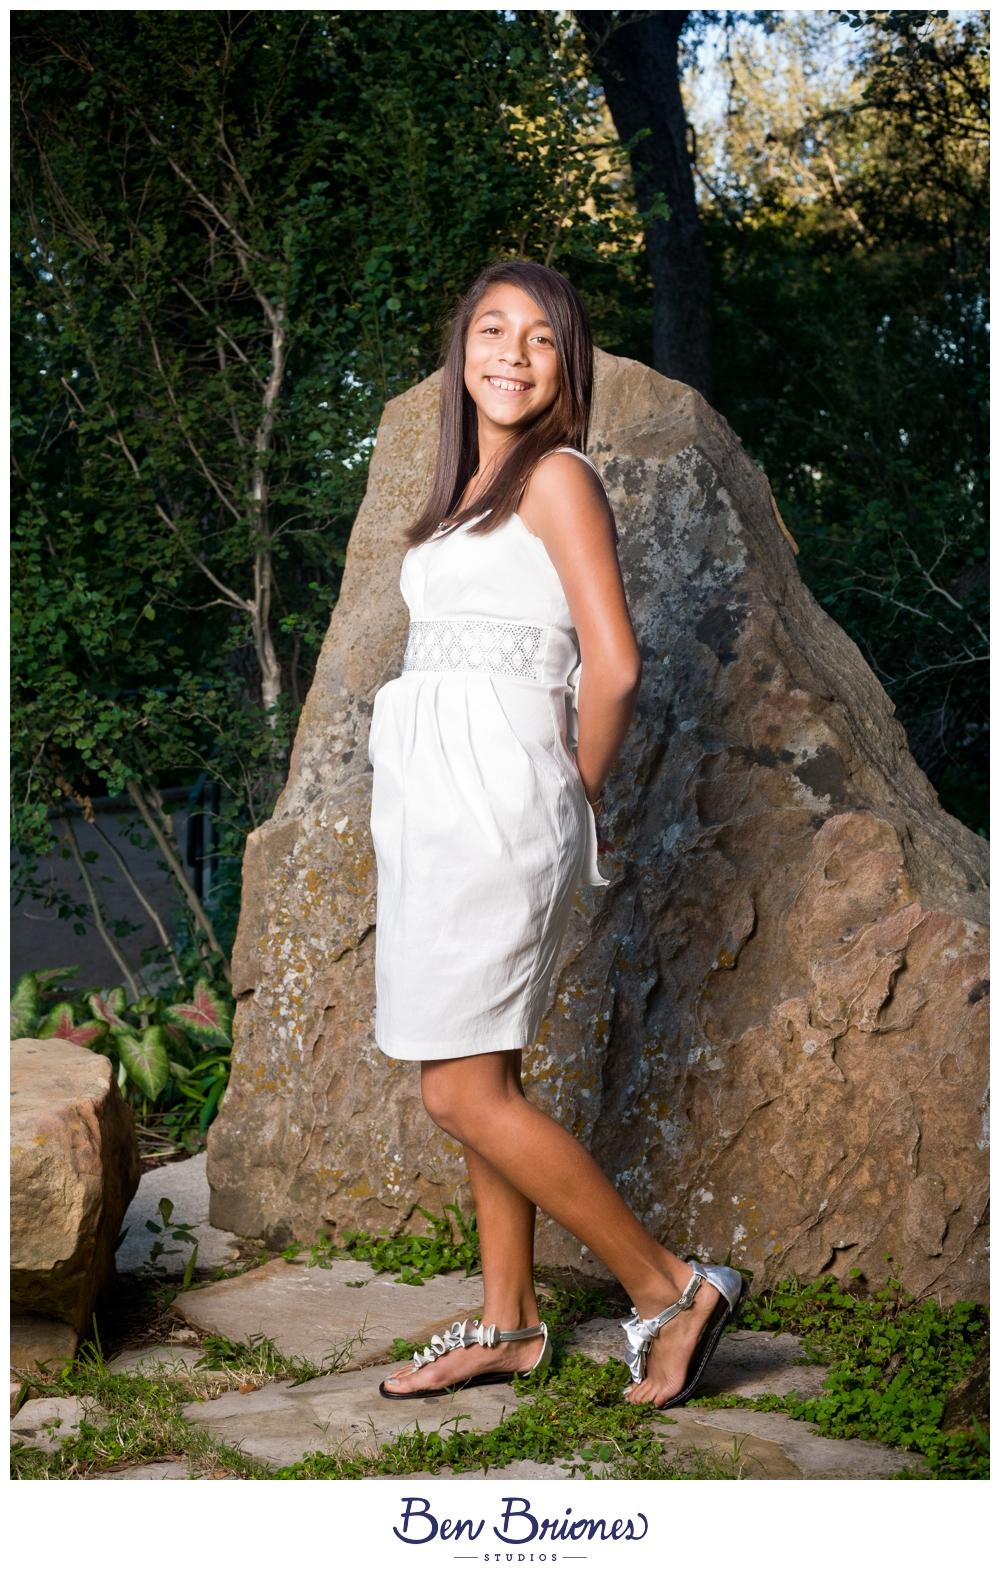 Benoni Nunez Family_PRINT_BBP-301_FB